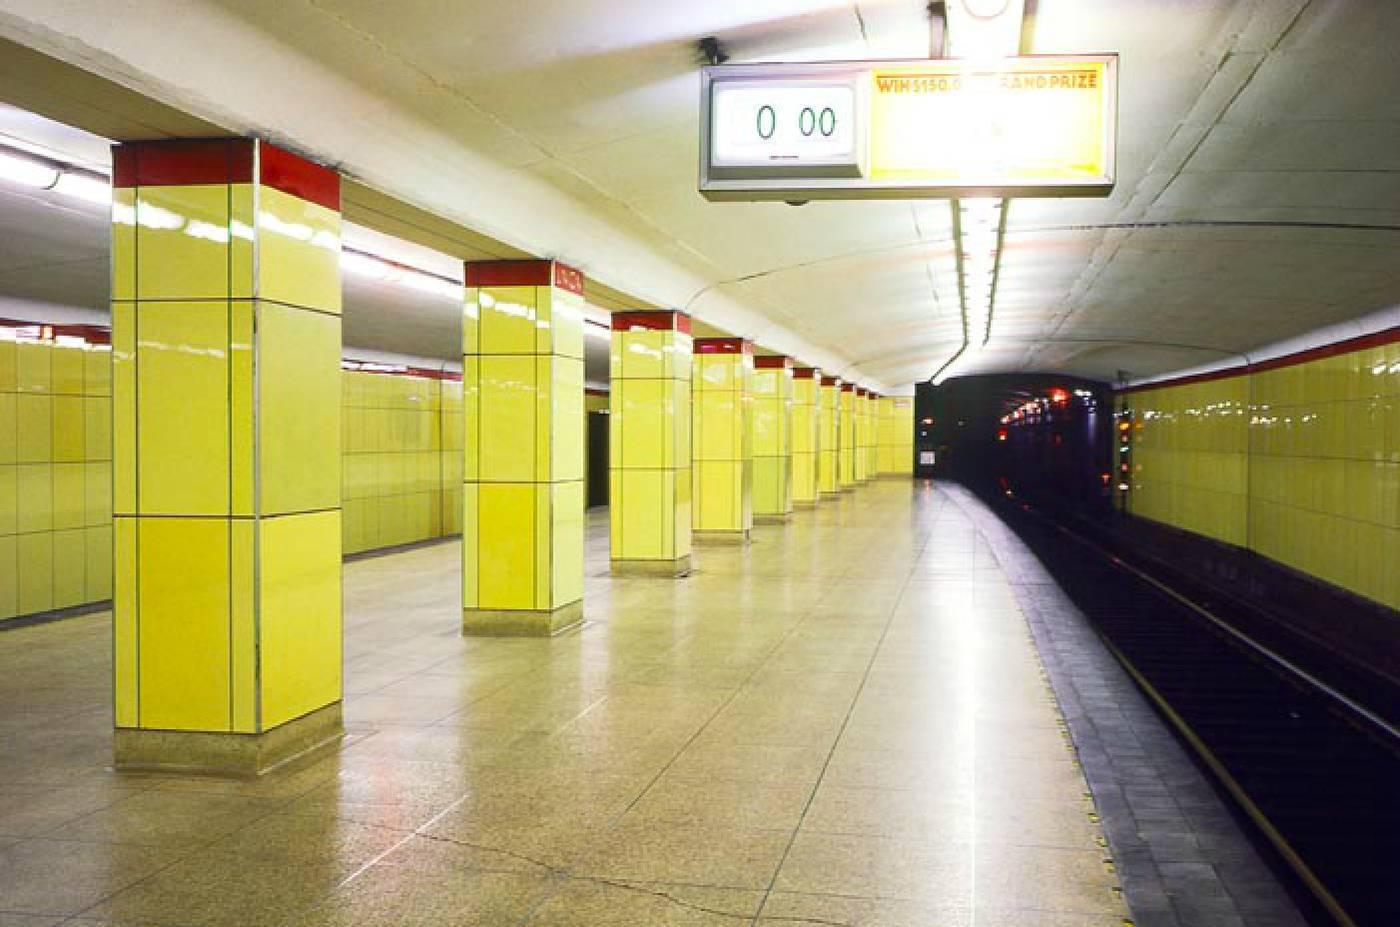 ttc station tiles